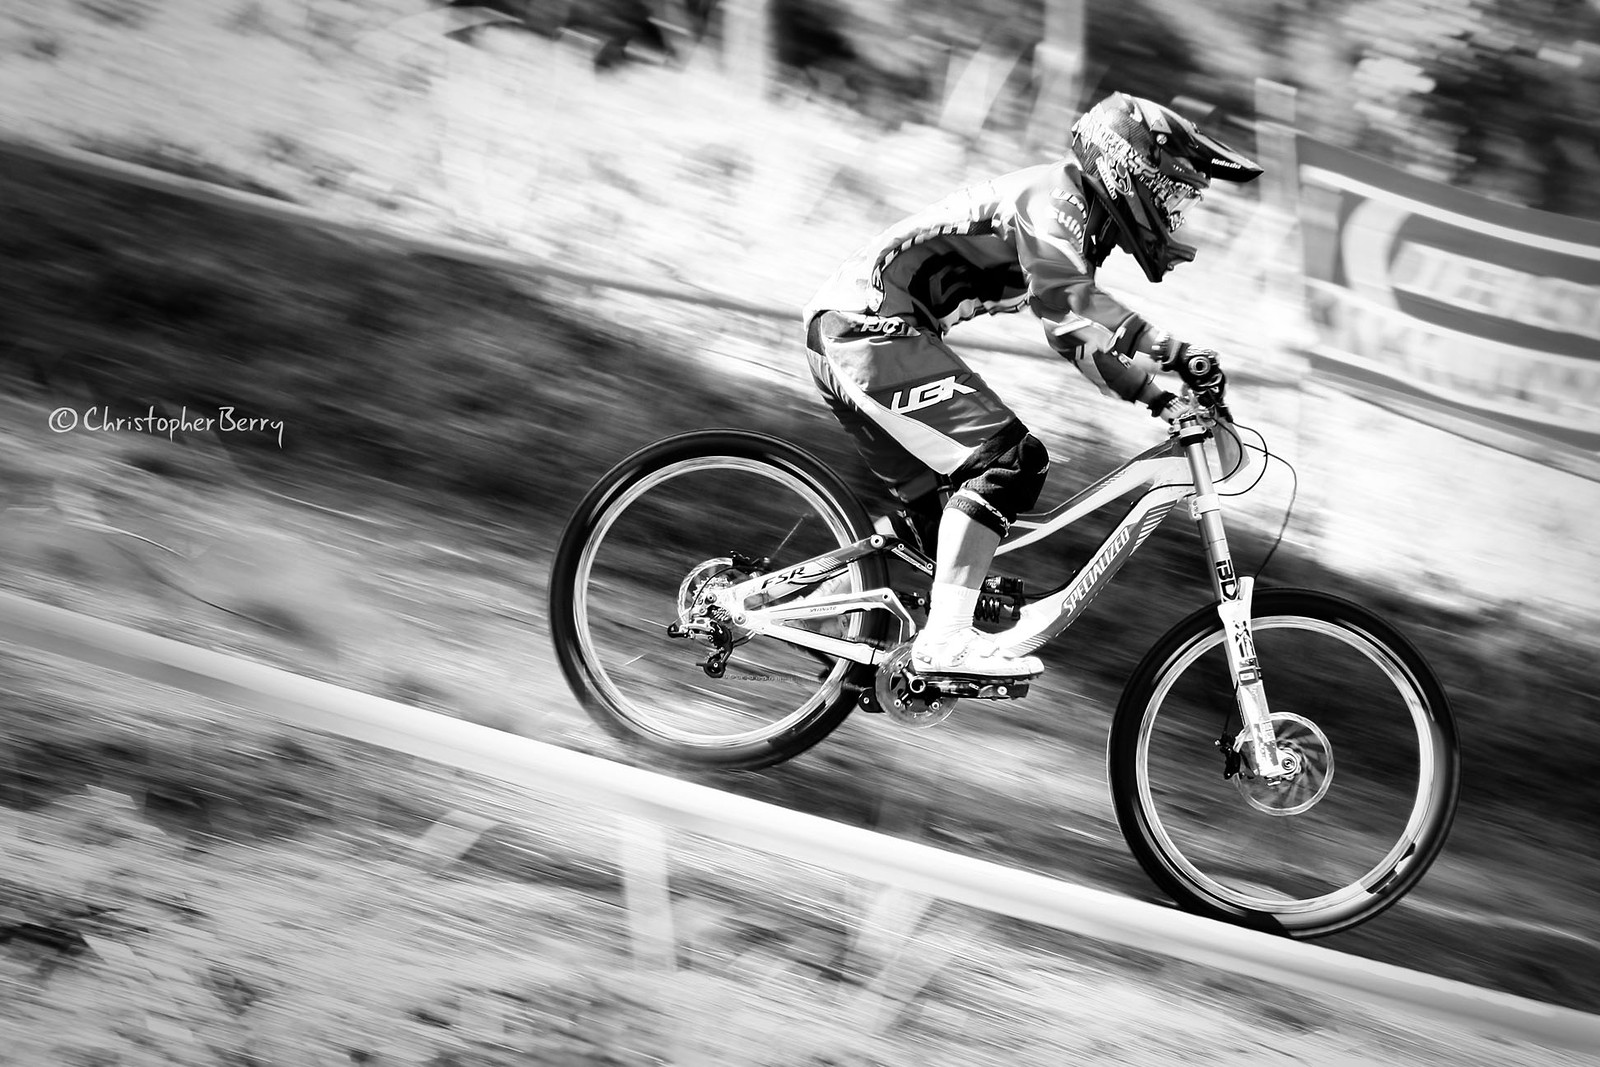 ShimanoUKDIseri02 - 2801 -mod - ombei - Mountain Biking Pictures - Vital MTB